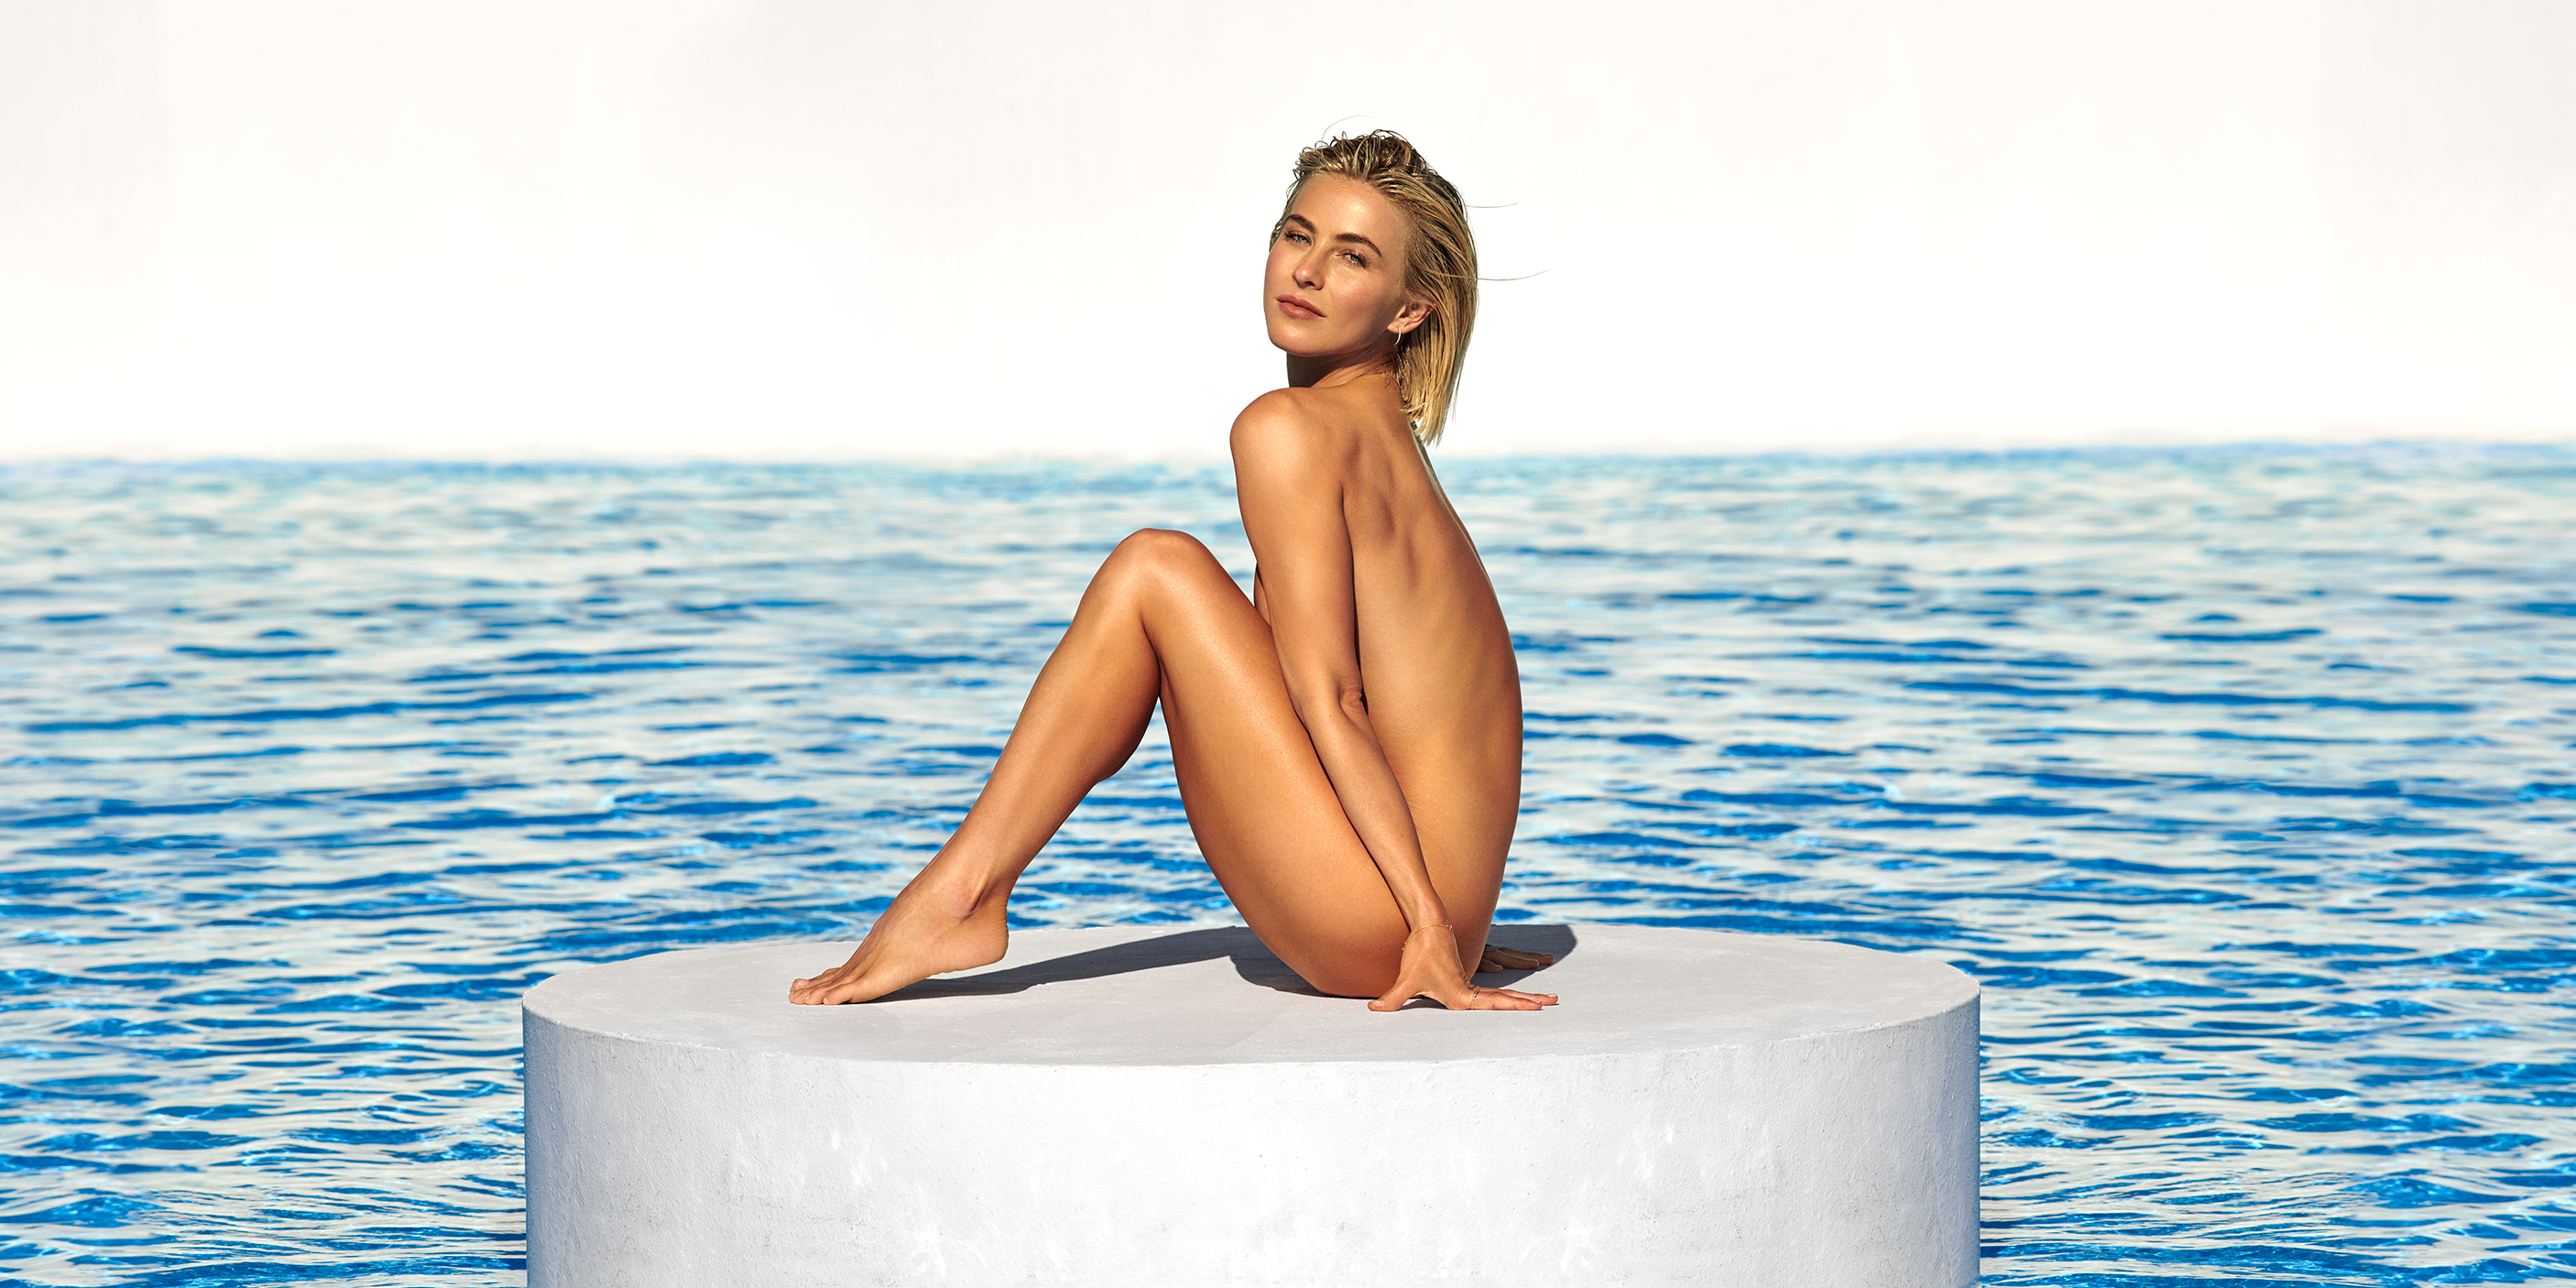 Julianne Hough Topless Instagram photo 23